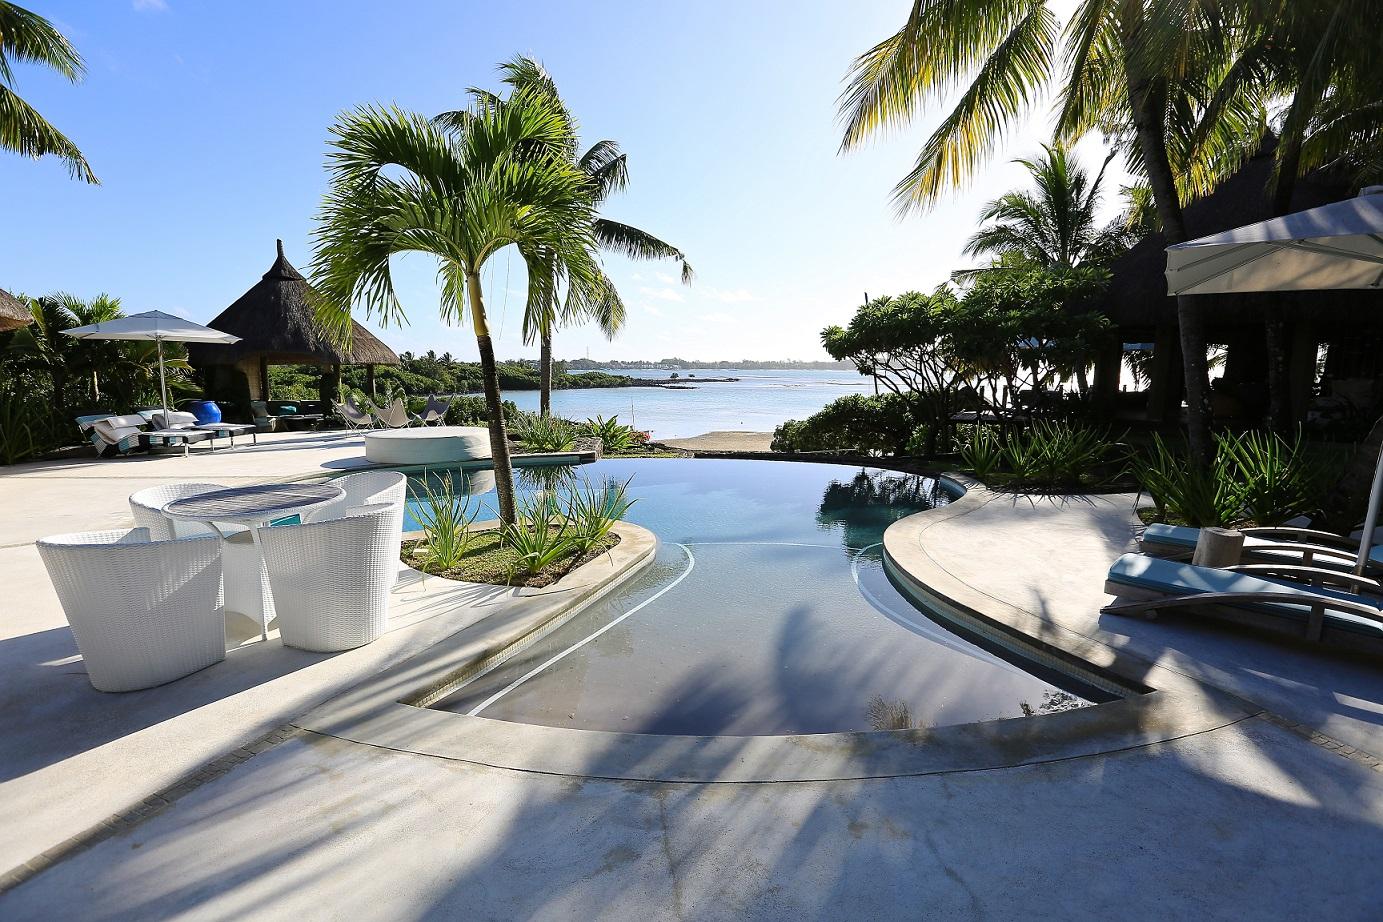 villa-de-luxe-ile-maurice-location-villa-ile-maurice-villa-rental-mauritius-villa-sable-et-mer-pool-piscine